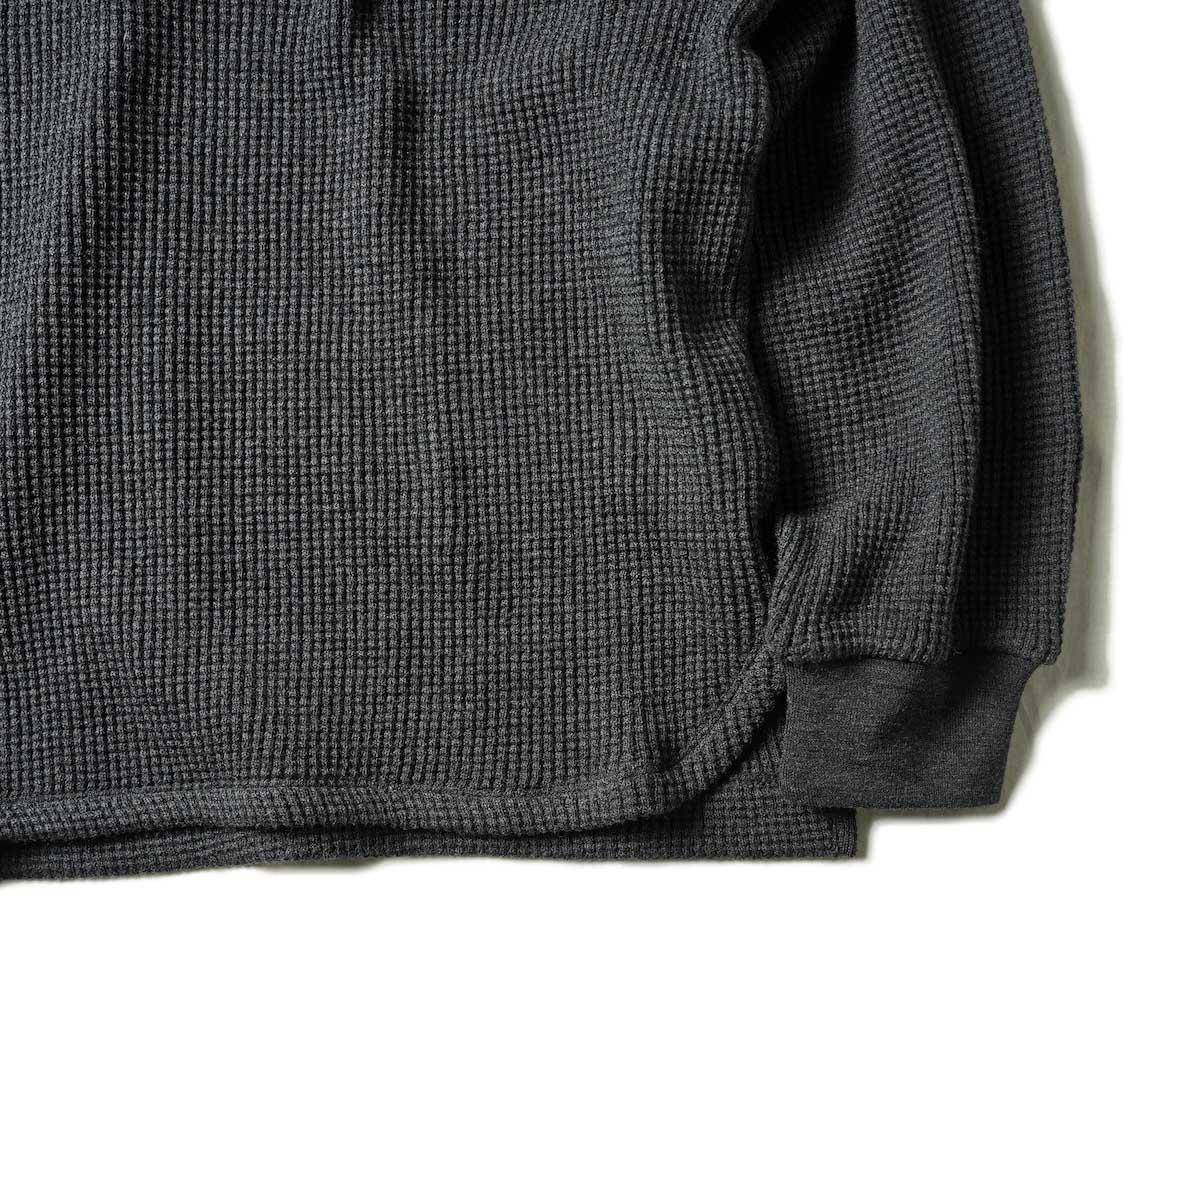 blurhms / Wool Cotton Big Waffle Crew-Neck (Heather Charcoal)裾、袖